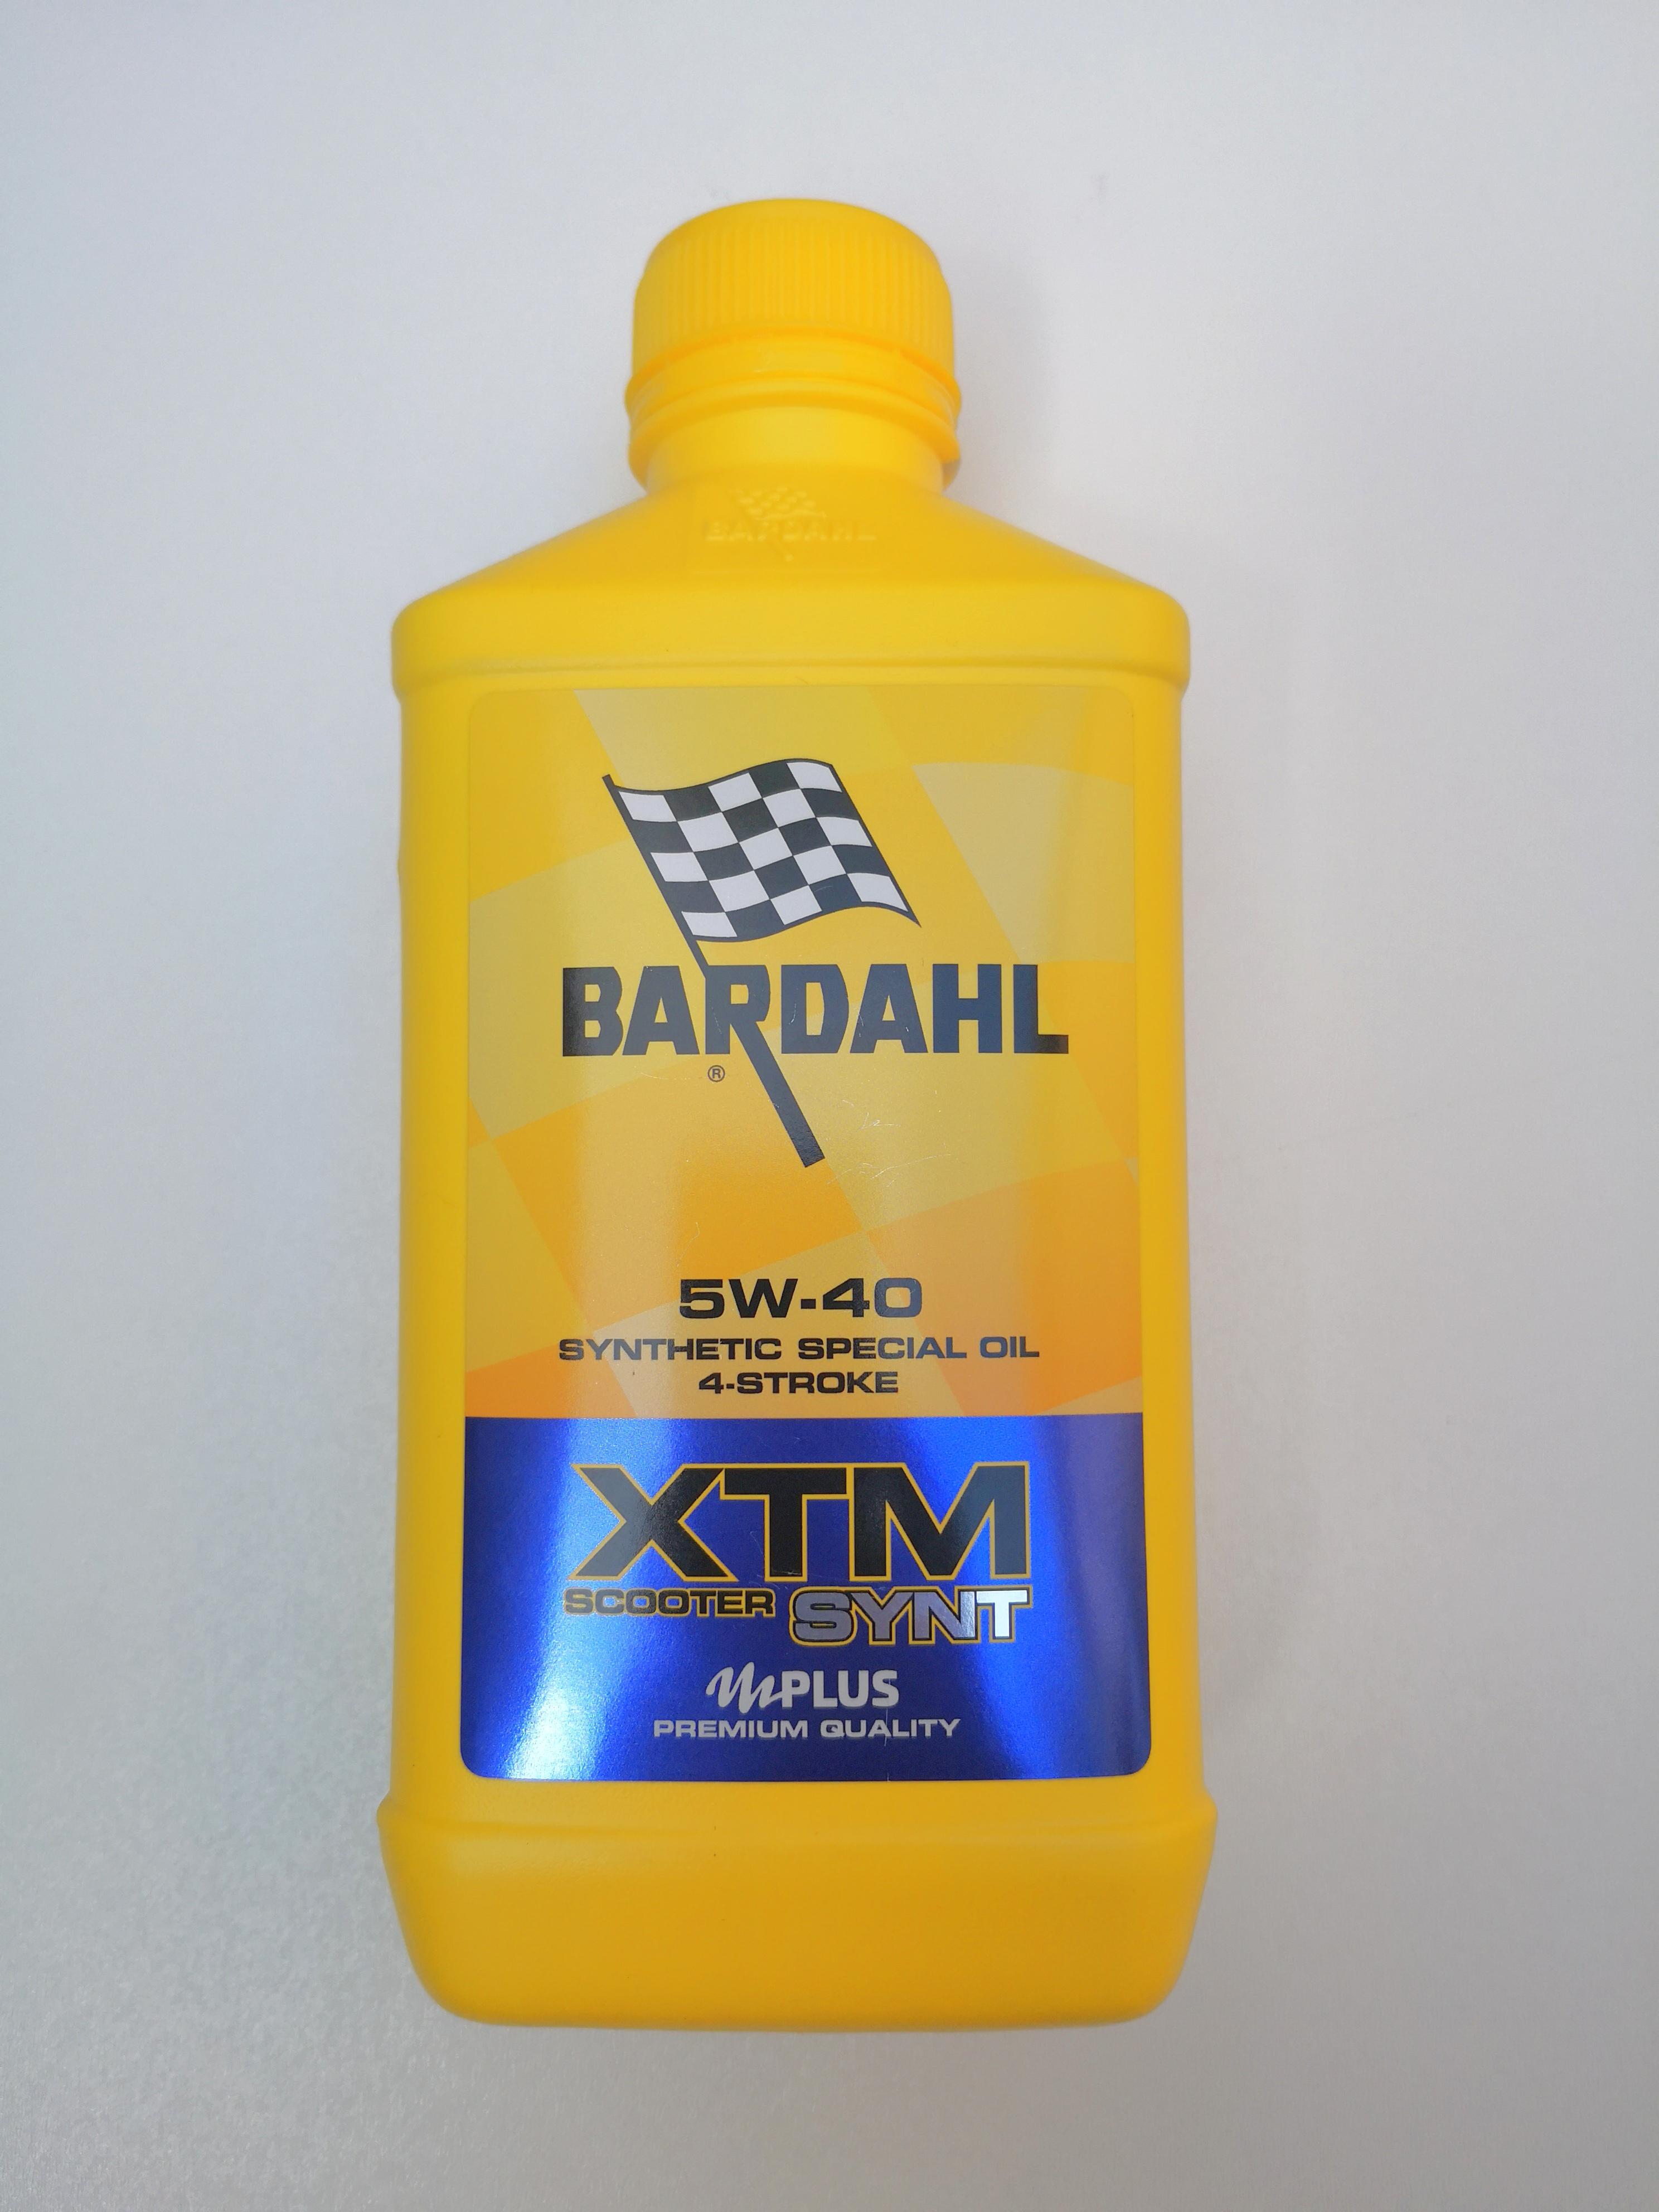 OLIO MOTORE BARDAHL XTM SYNT per MOTO e SCOOTER 4 TEMPI  - SEMISINTETICO  SAE 5W40 - MOTOFORNITURE GF